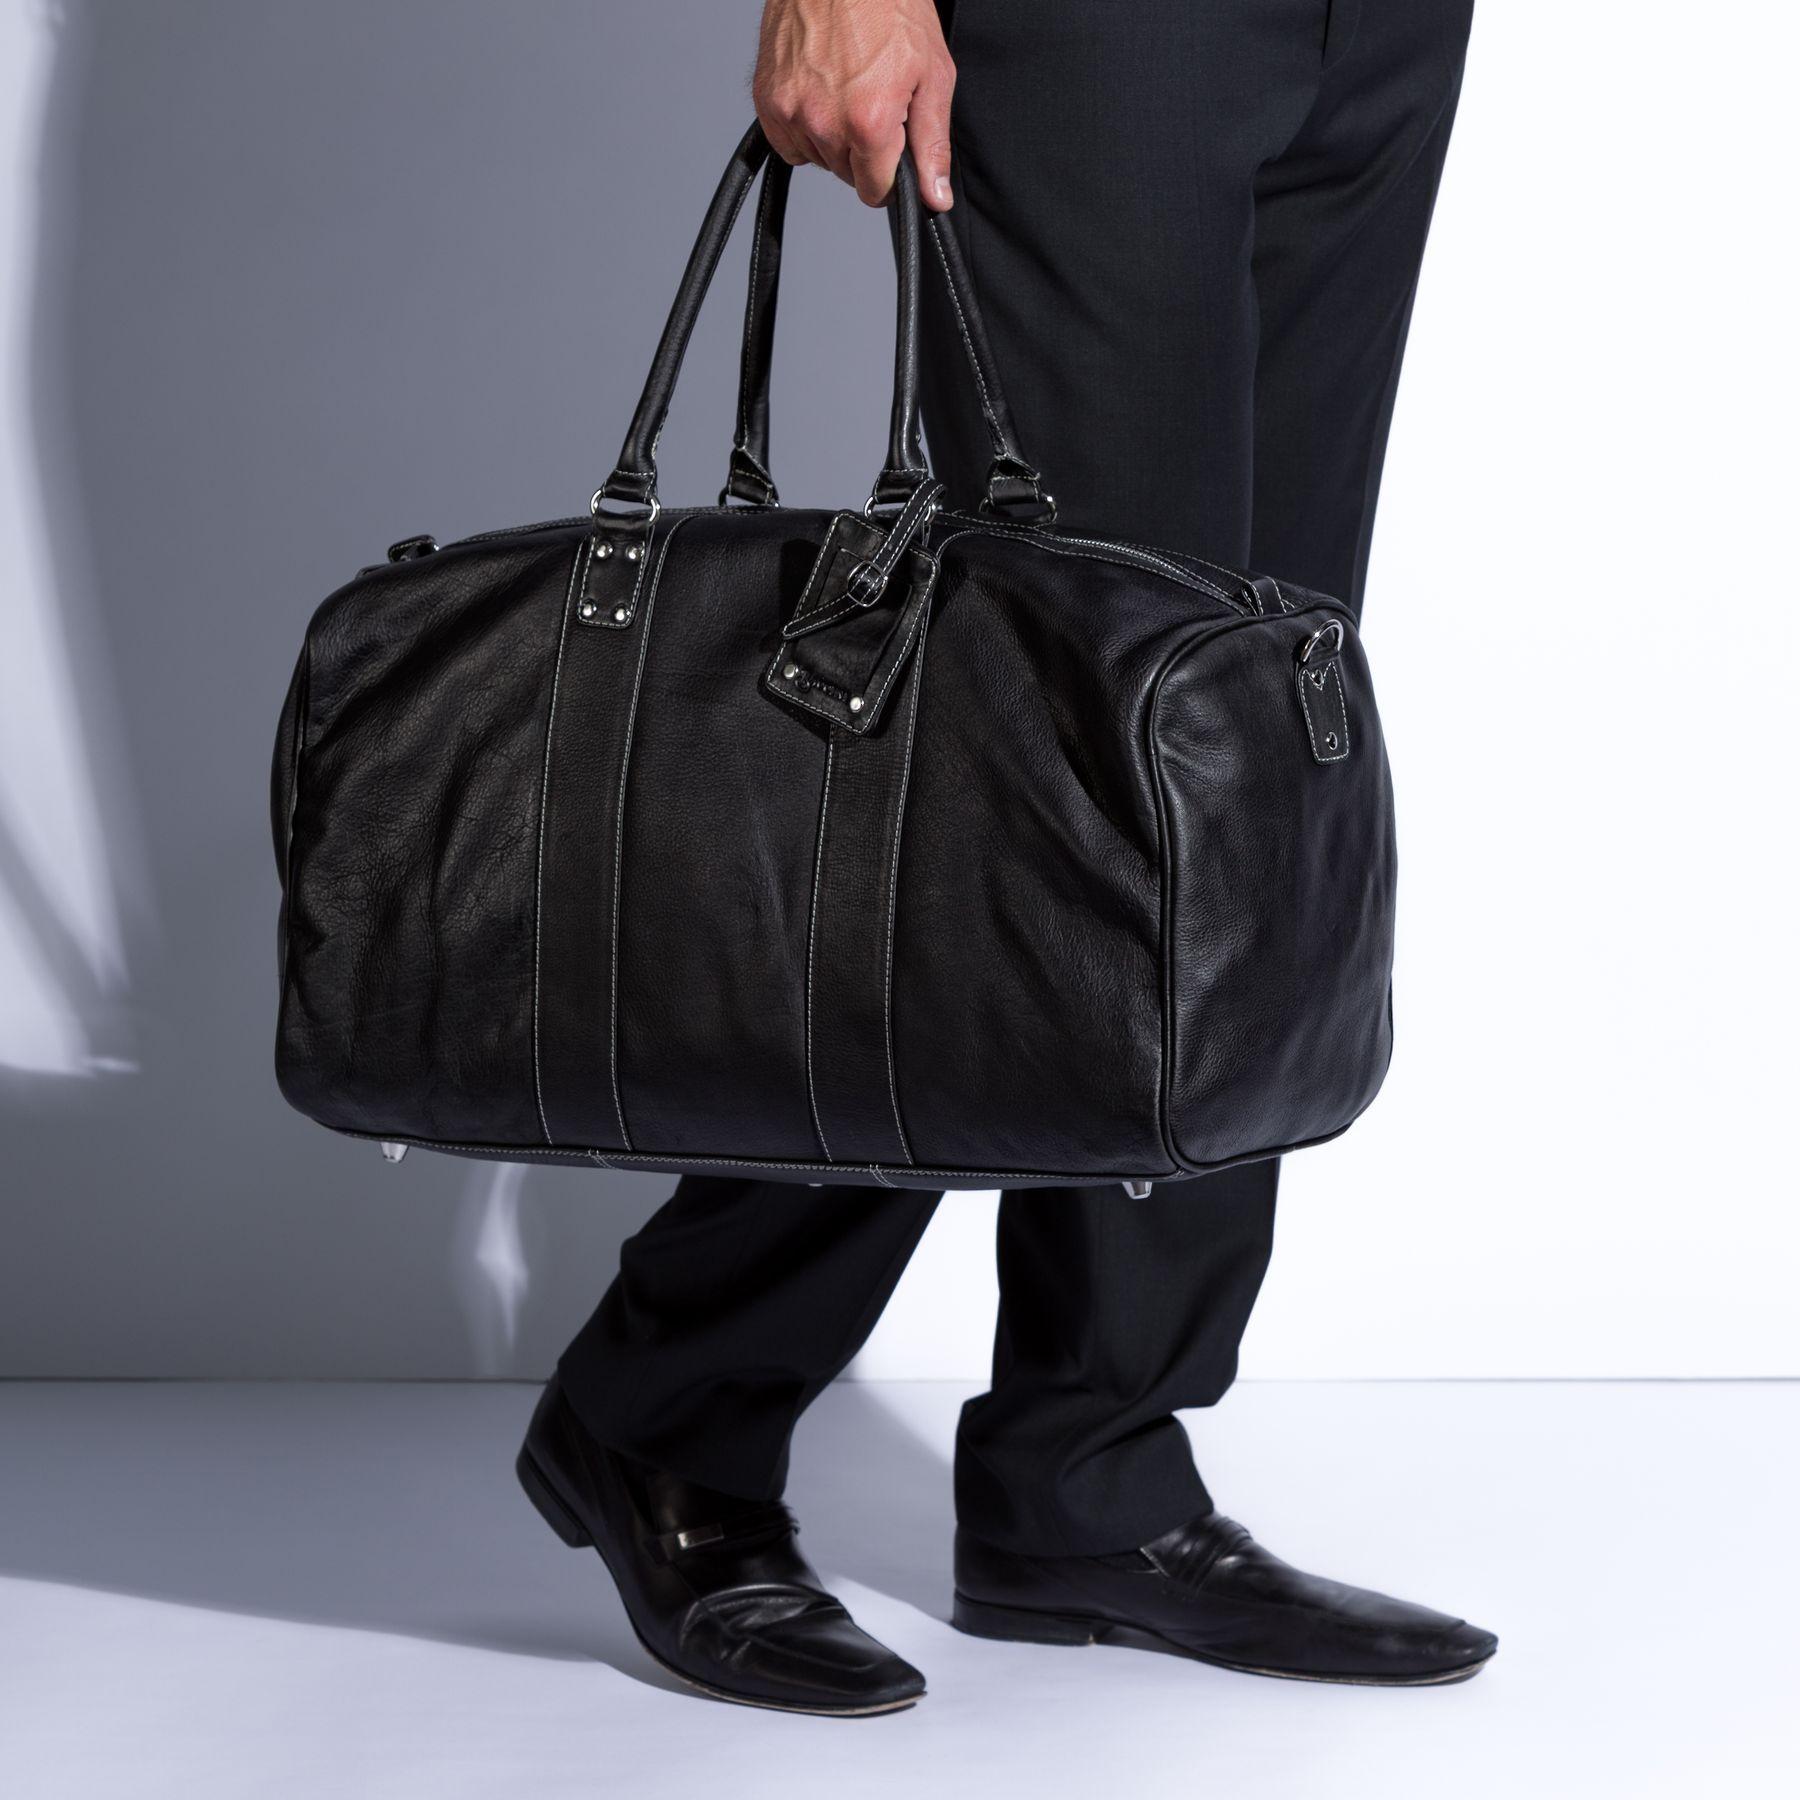 e961b6f85278 BACCINI travel bag holdall Nappa Leather JACKSON black weekender ...